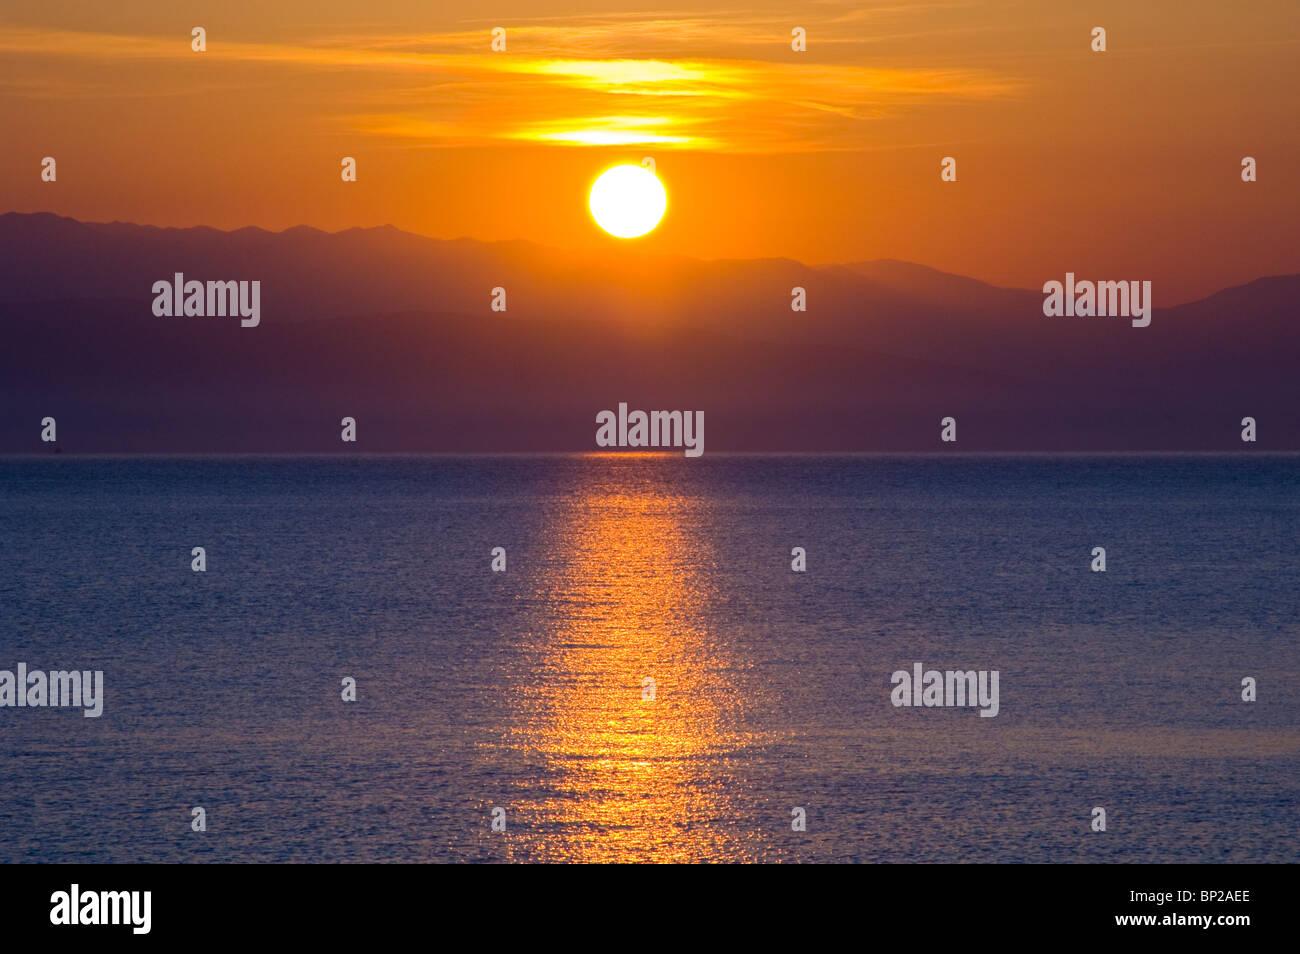 Golden sunrise over the Albanian mountains from Sidari on the Greek island of Corfu Greece GR - Stock Image